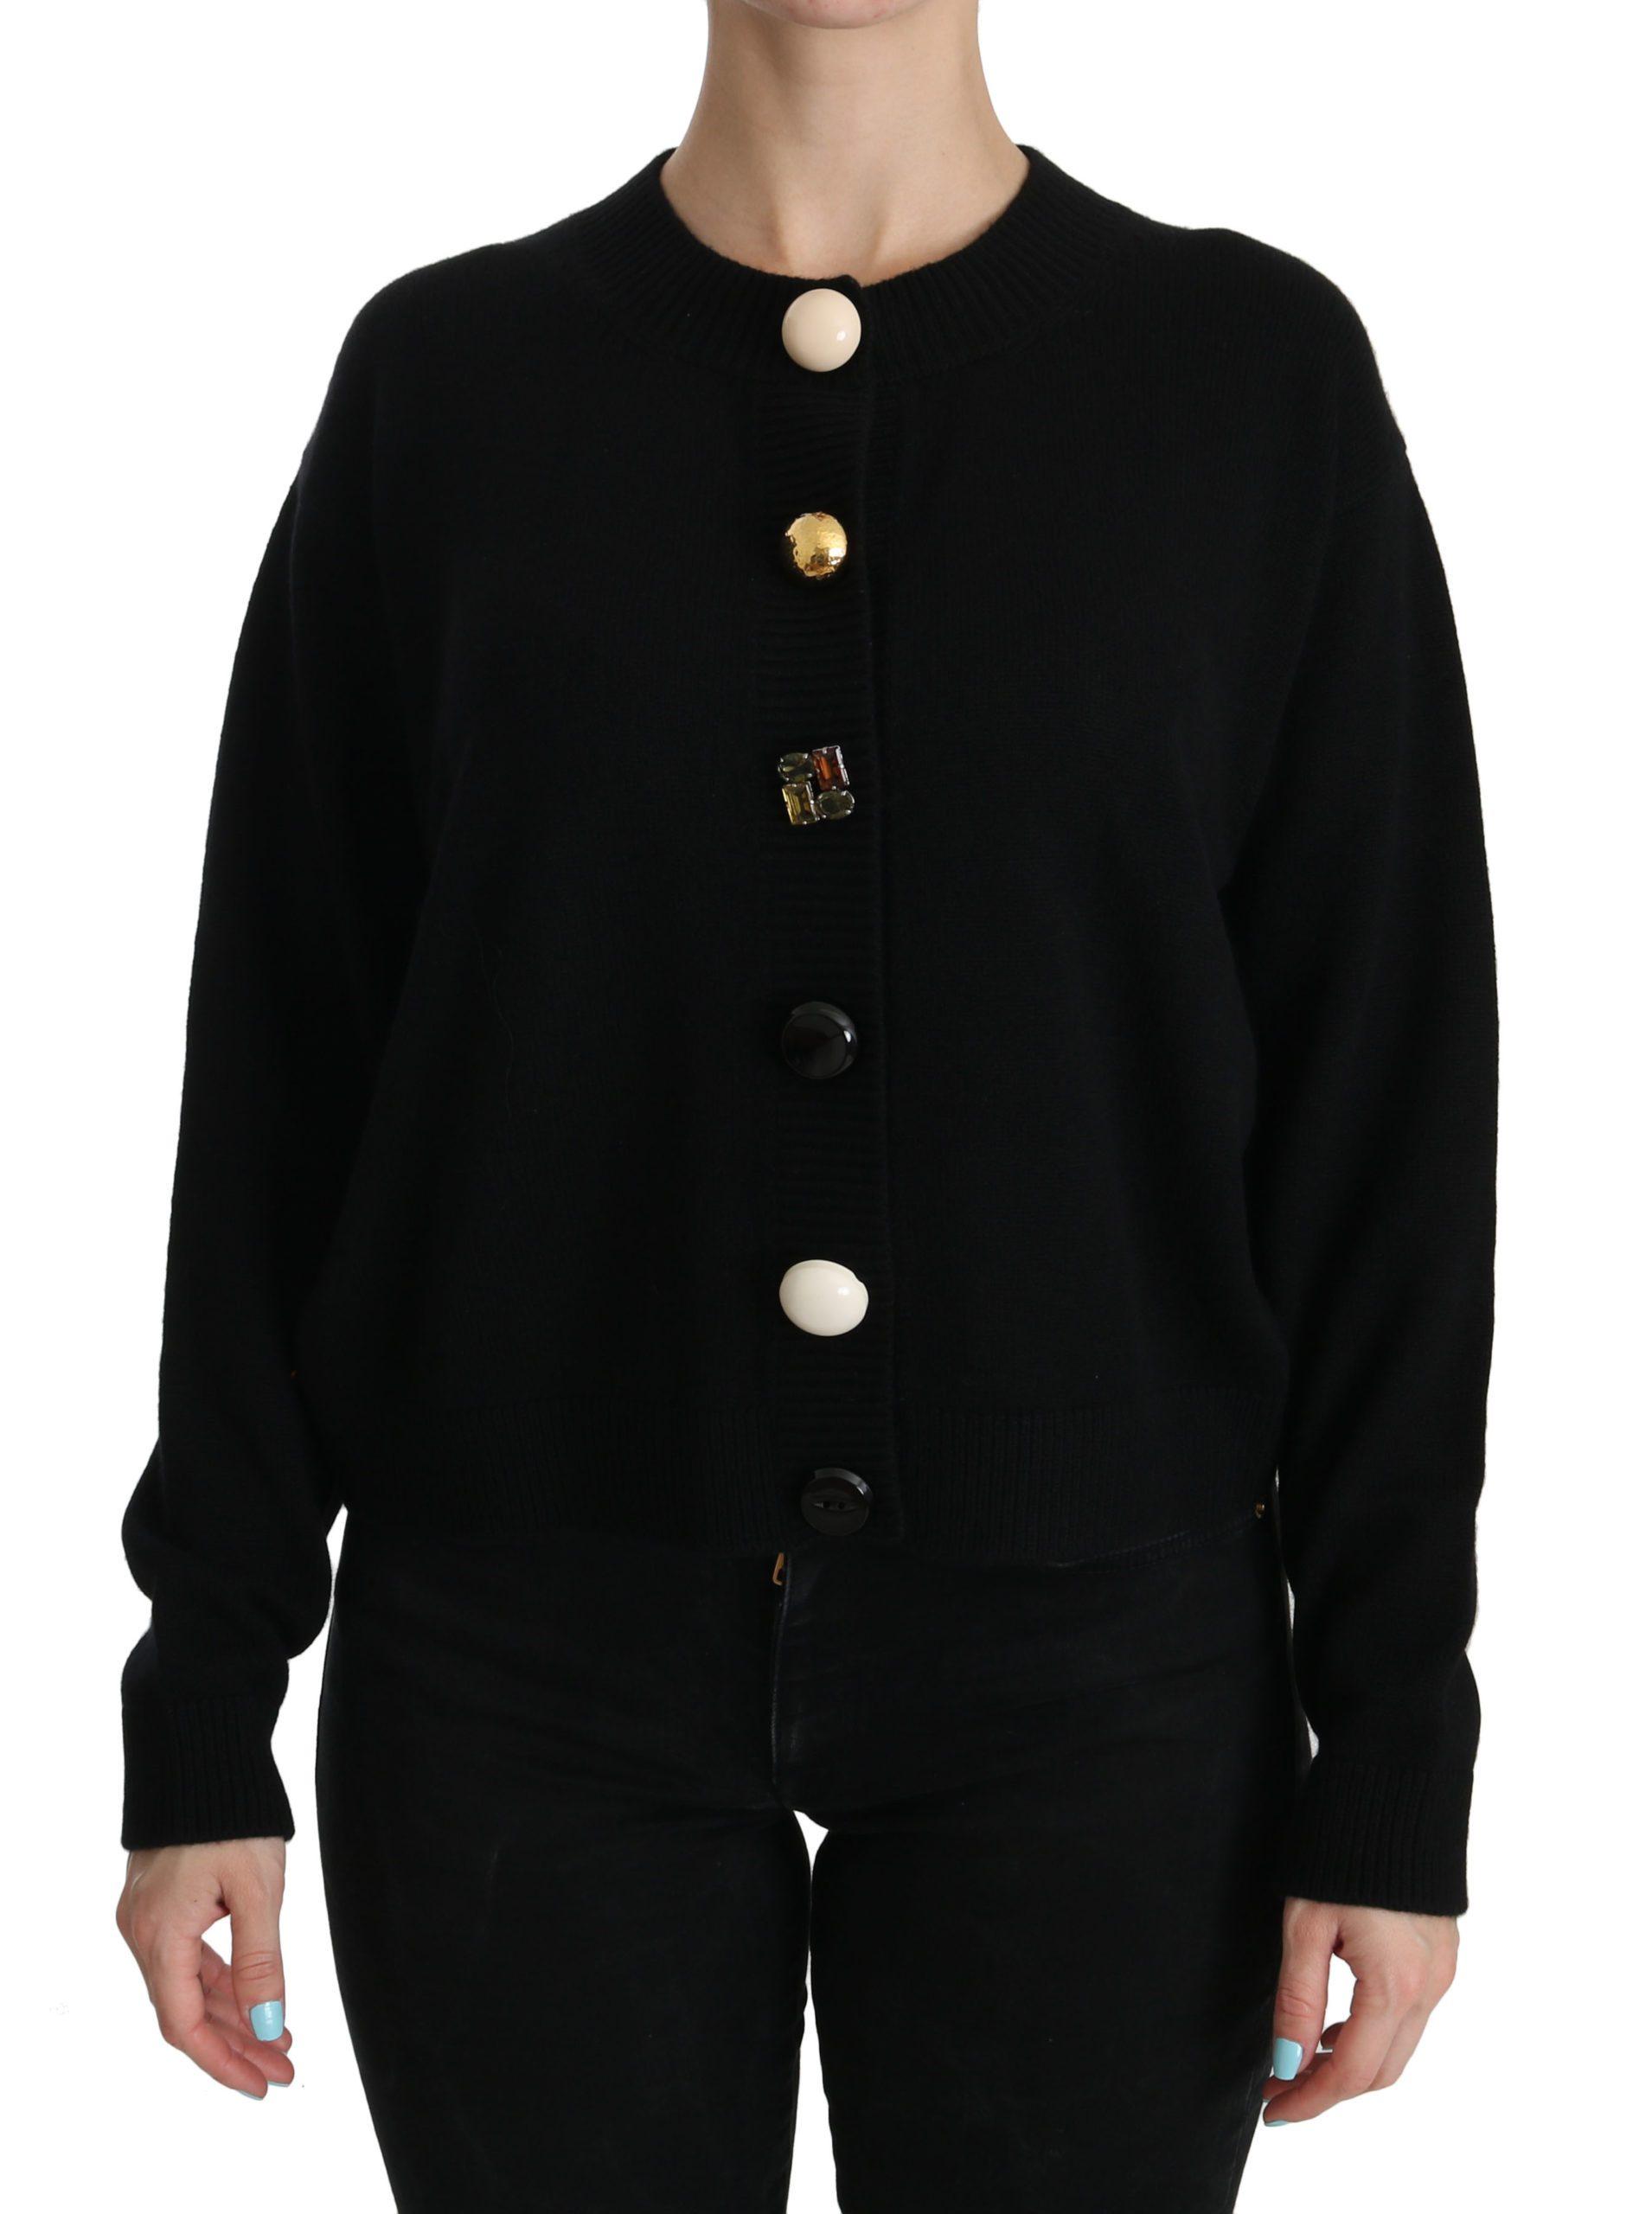 Dolce & Gabbana Women's Button Embellished Cardigan Black TSH3861 - IT40|S